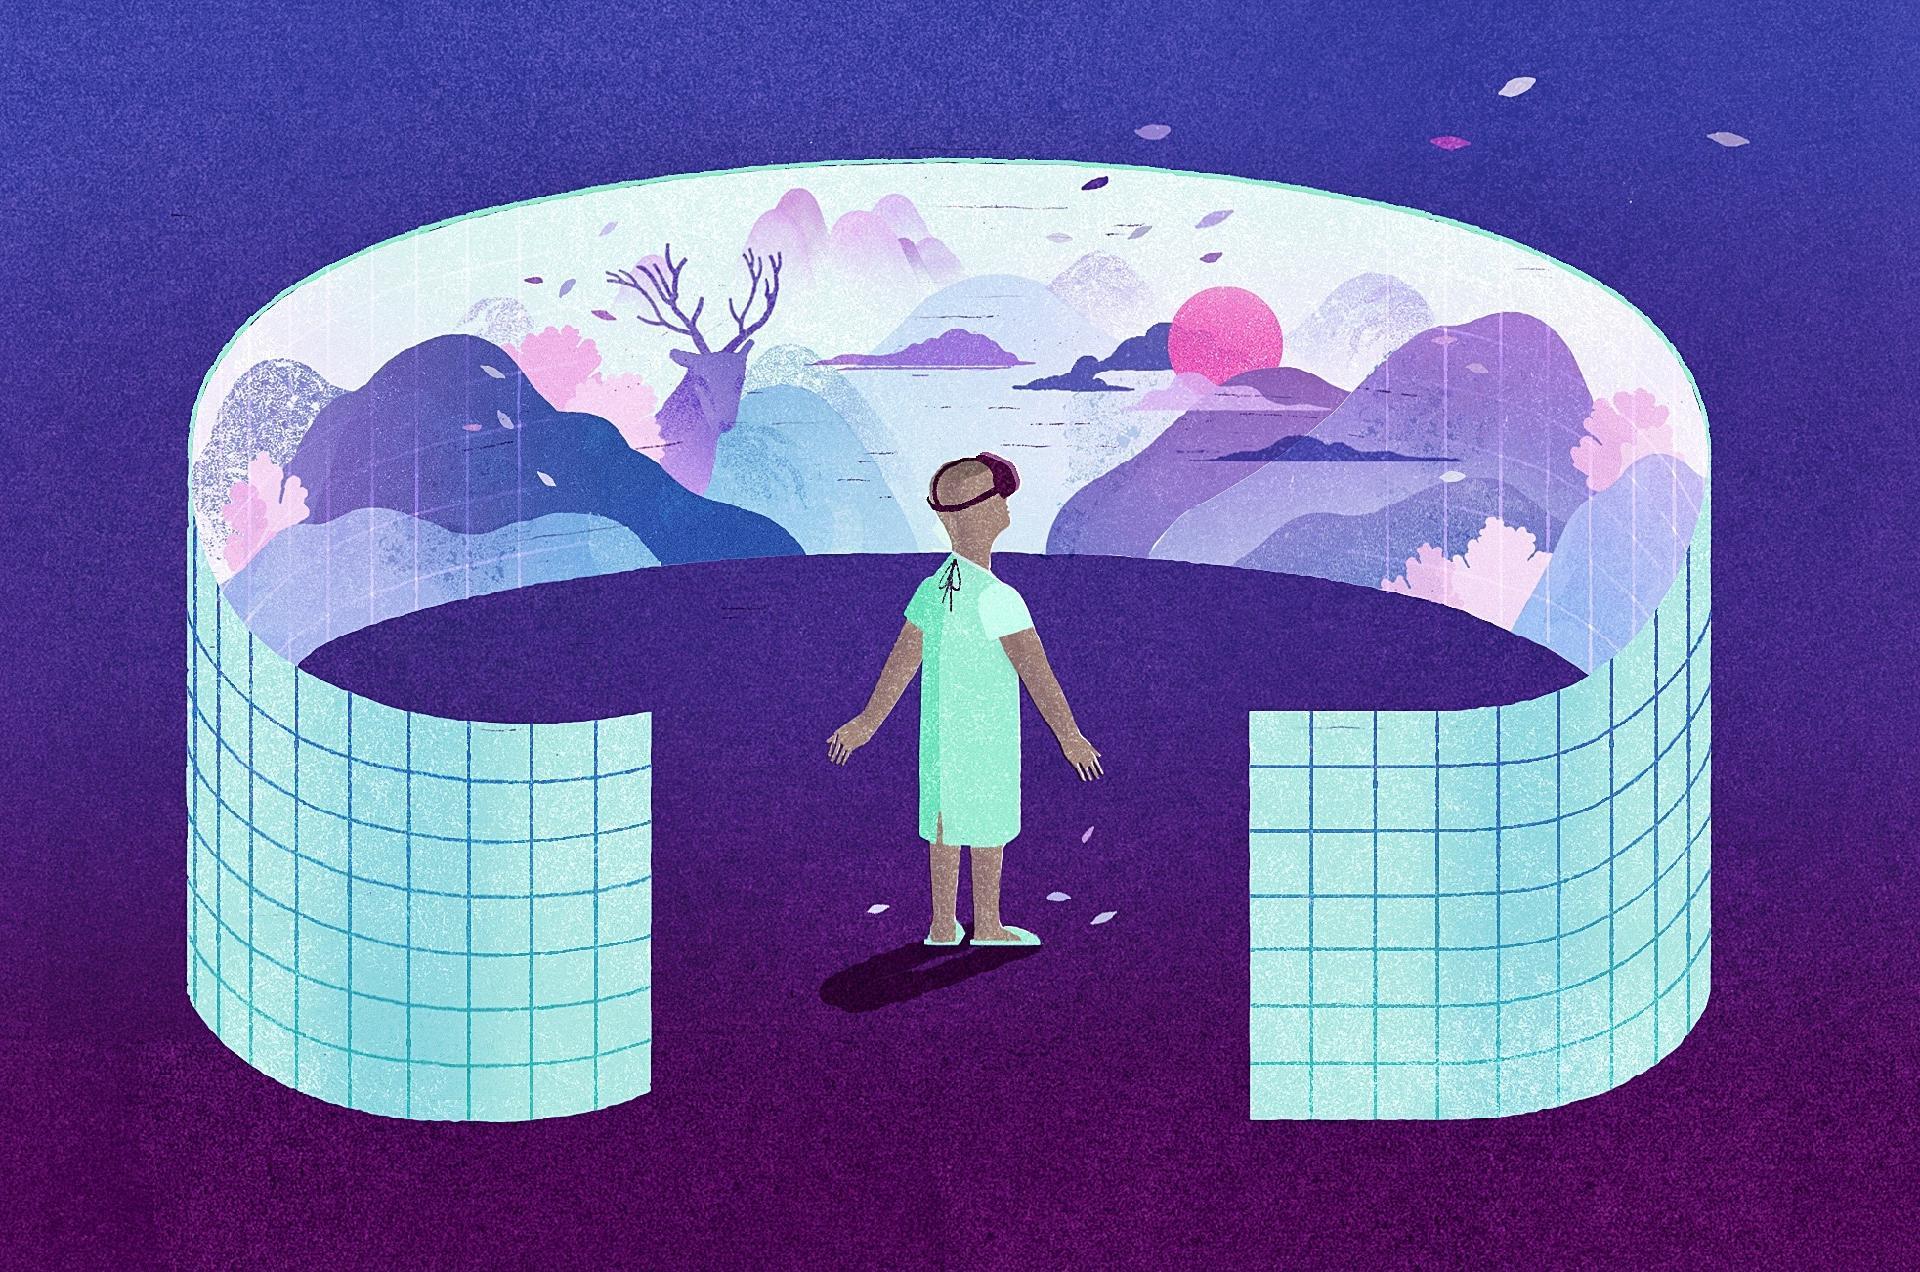 Como a realidade virtual é usada na terapia contra a dor - 04/05/2019 - UOL  VivaBem